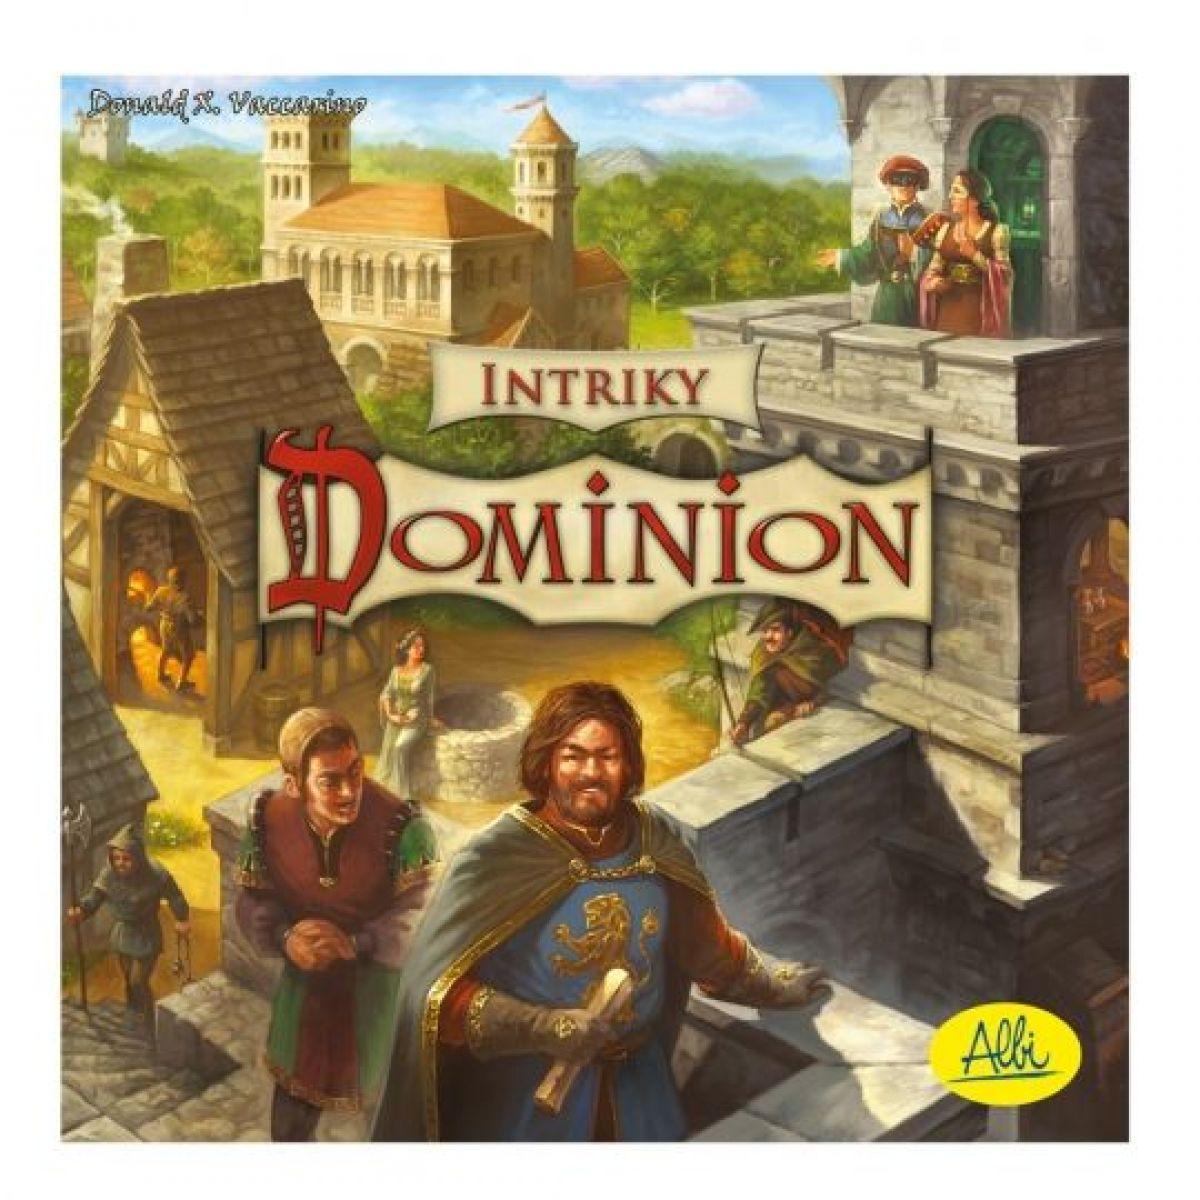 Albi Dominion Intriky